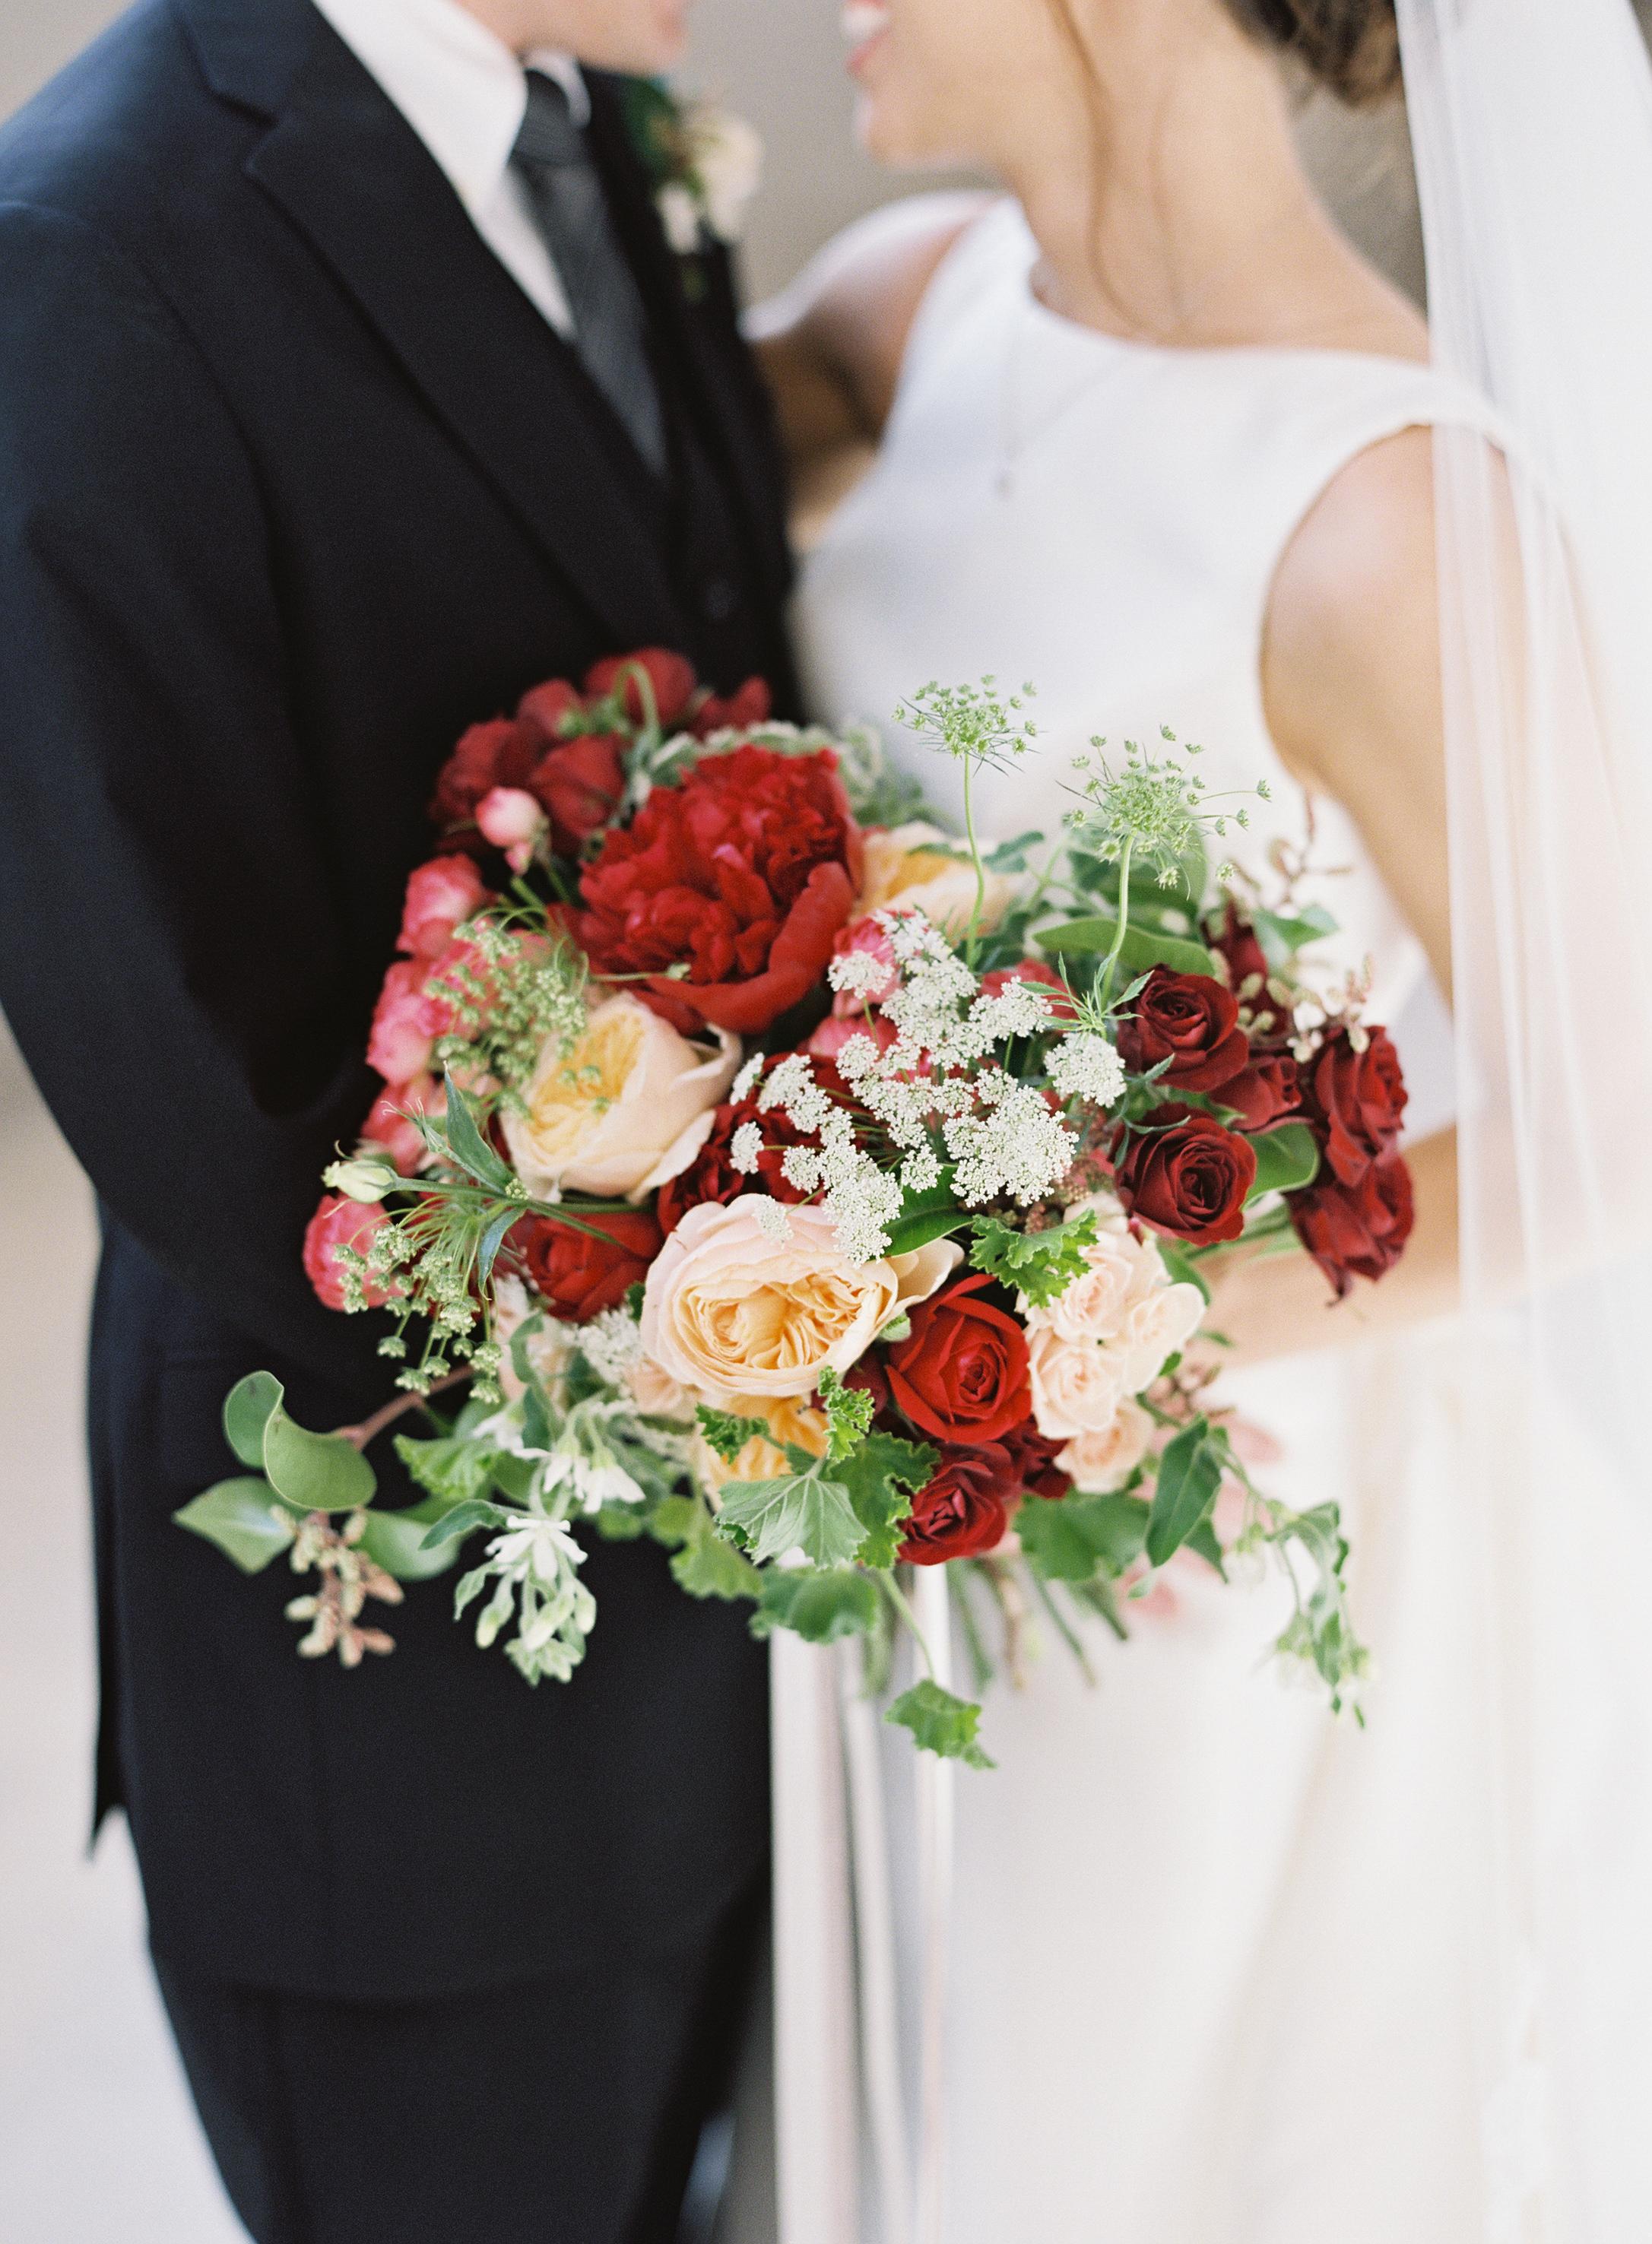 Meghan Mehan Photography - California Wedding Photographer | San Francisco City Hall Wedding 035.jpg